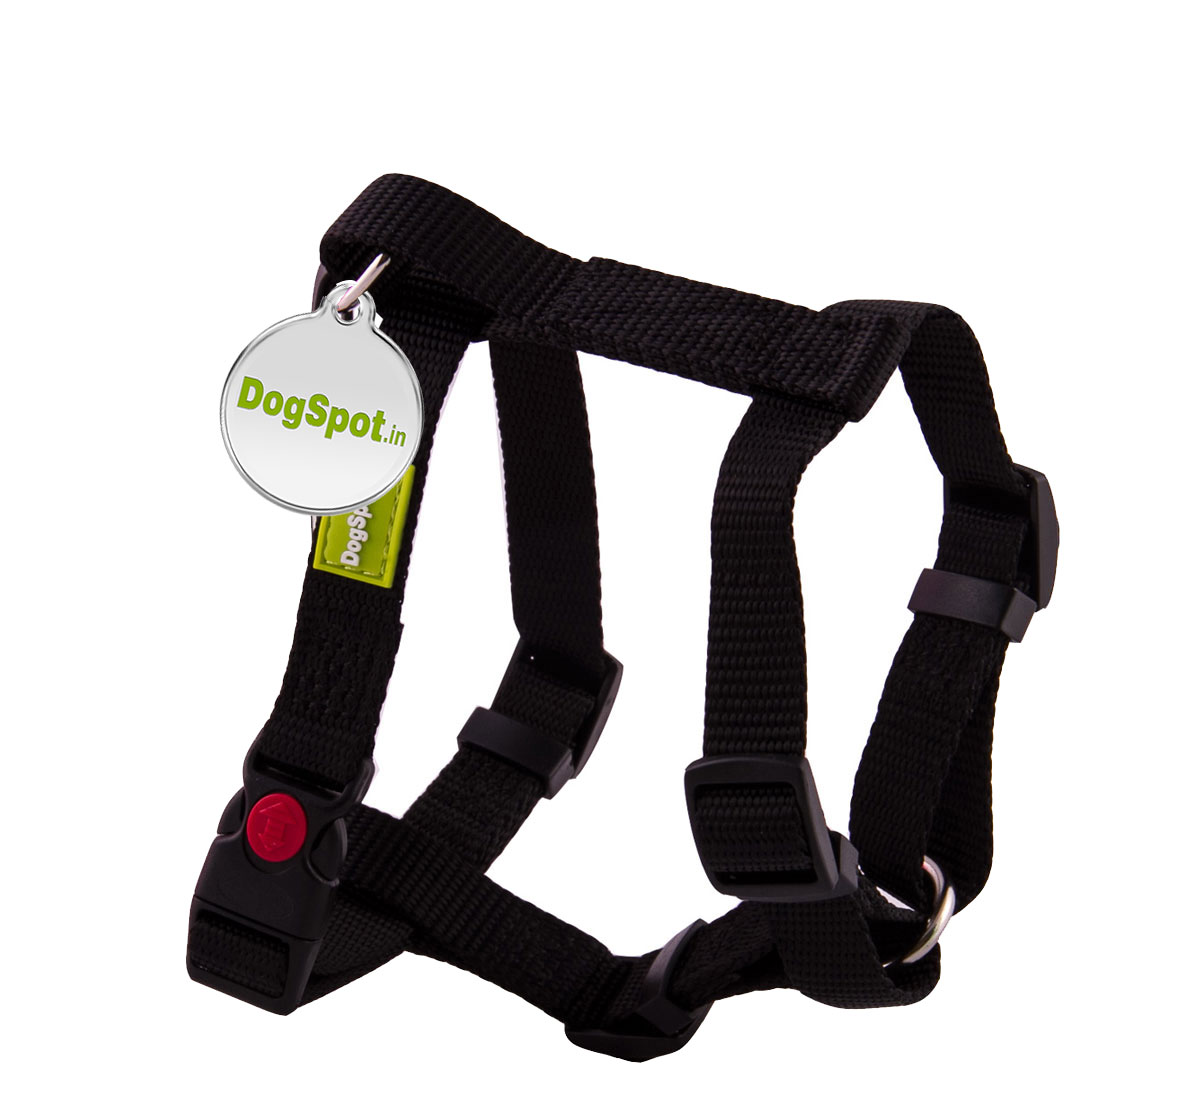 DogSpot Premium Harness Black - Medium With Wag Tag